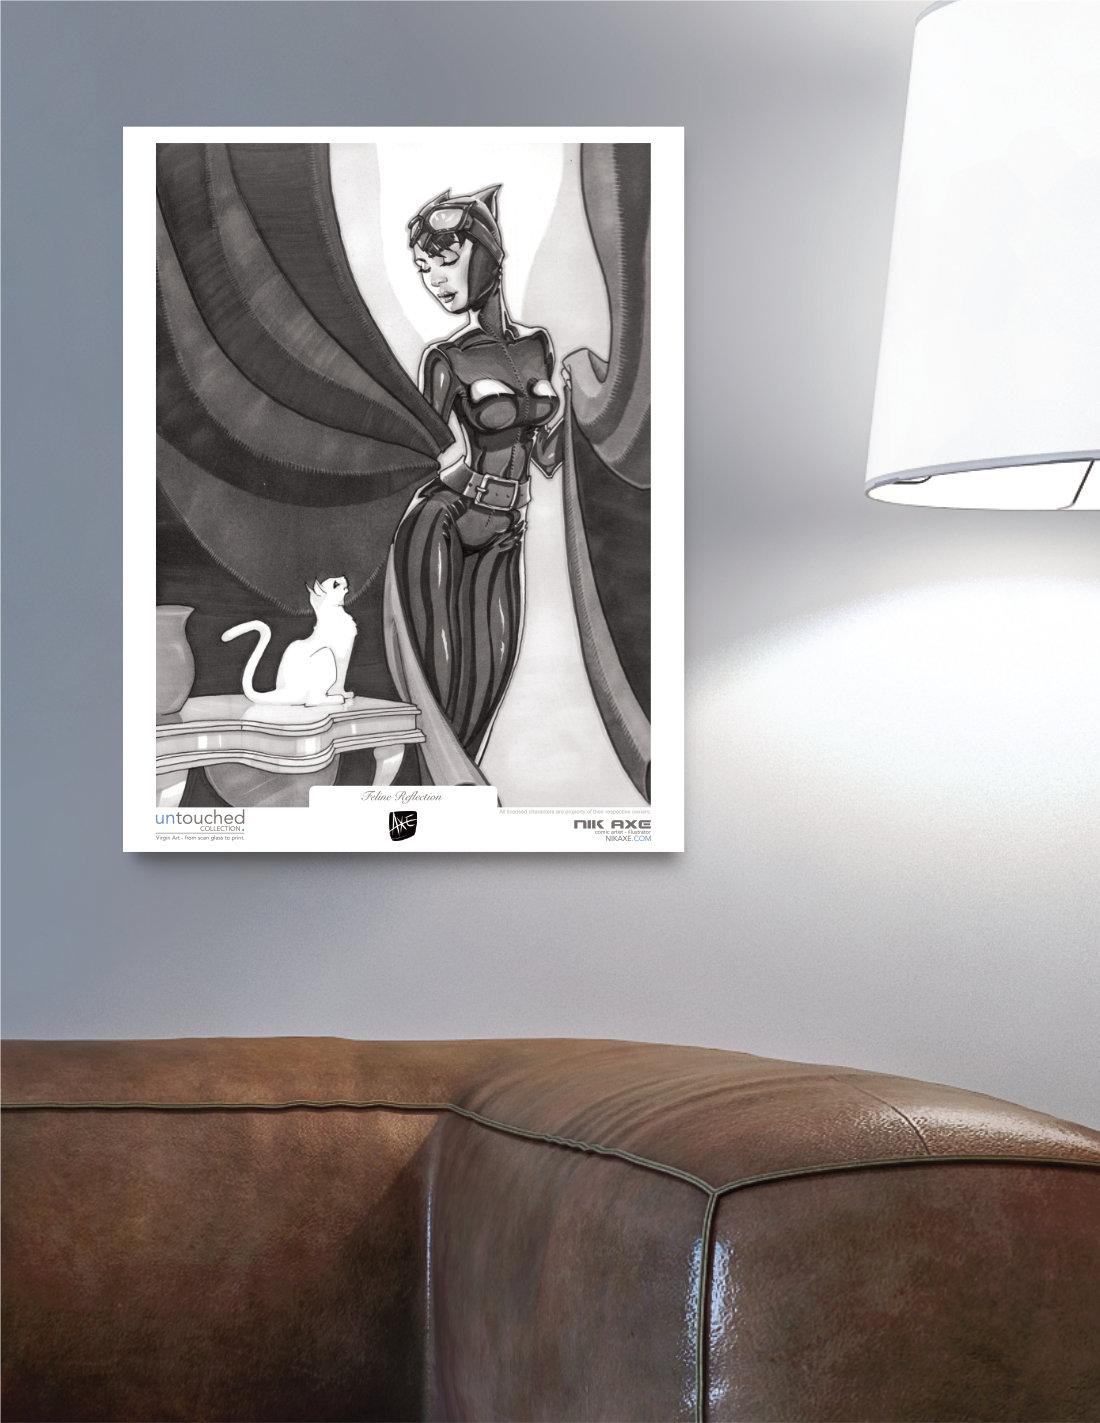 Catwoman Art Print Batman DC Comics Feline Reflection Hanging in Livingroom